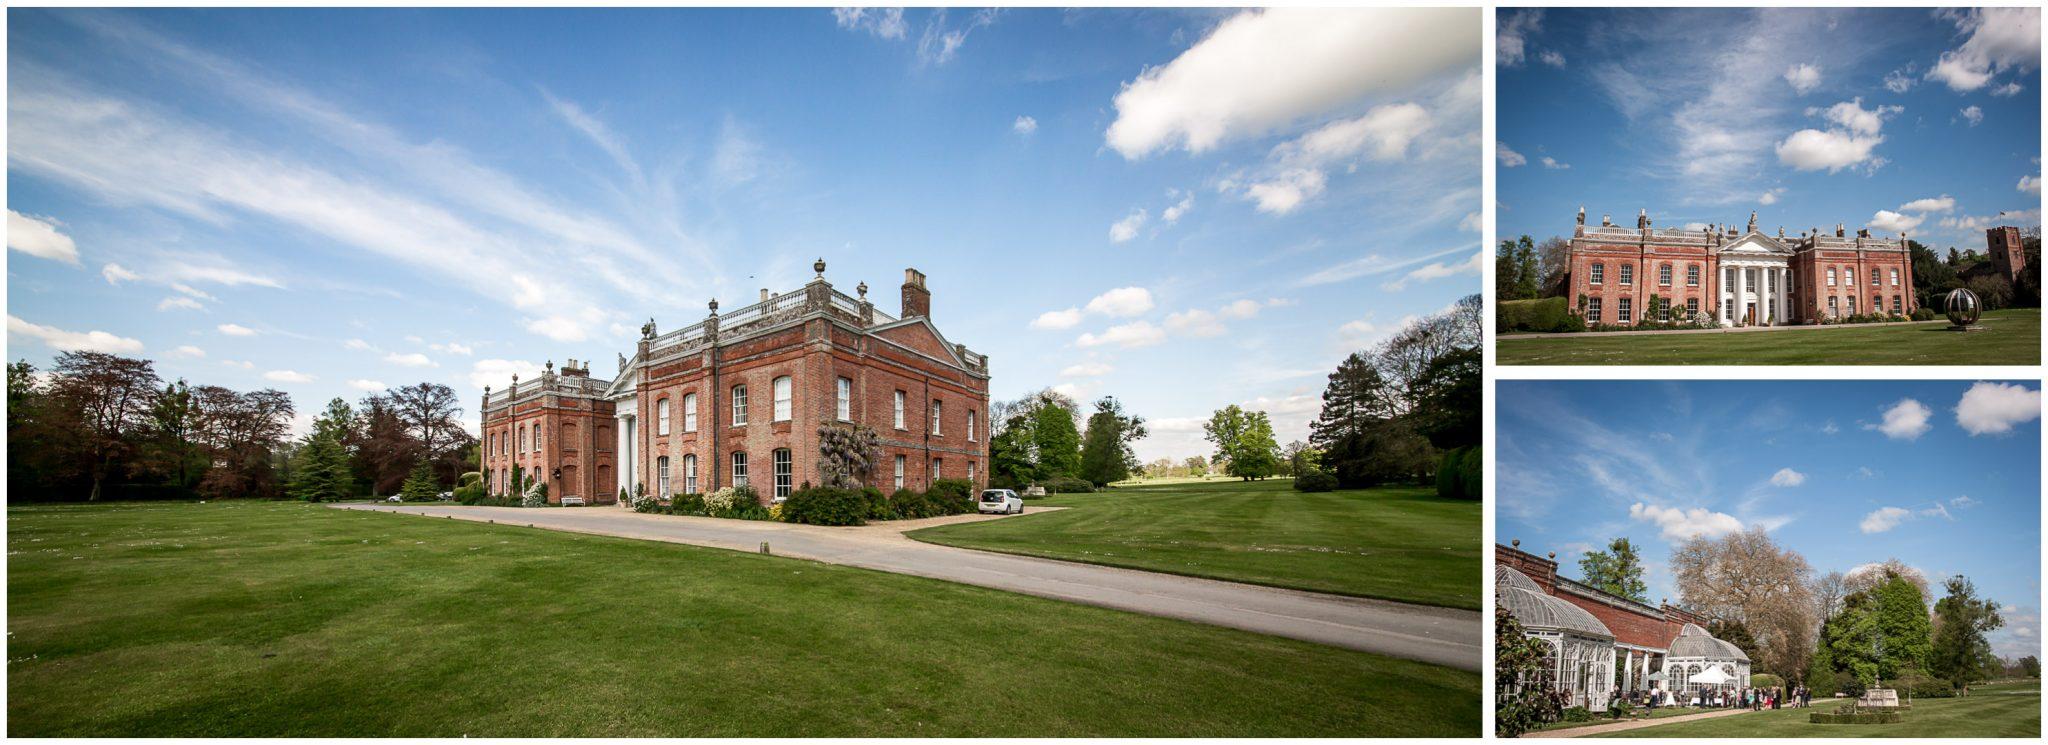 Avington Park wedding photography venue exterior with blue skies